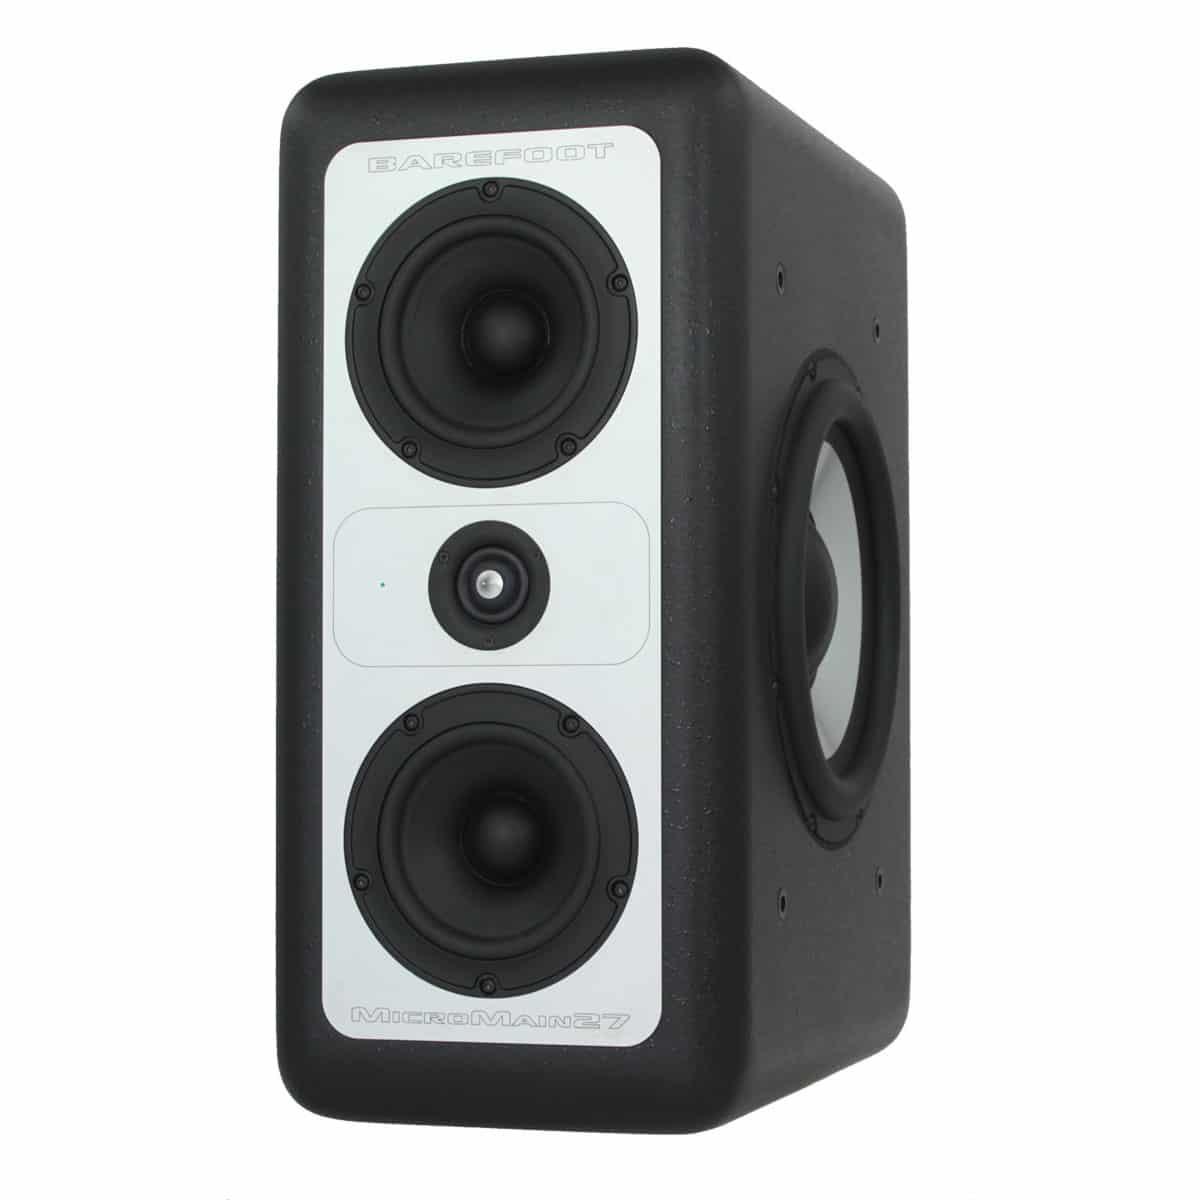 Barefoot Sound MicroMain 27 Gen2 Pro Audio, Audio Monitors, Studio Monitor Barefoot Sound Micromain 27 Gen2 2